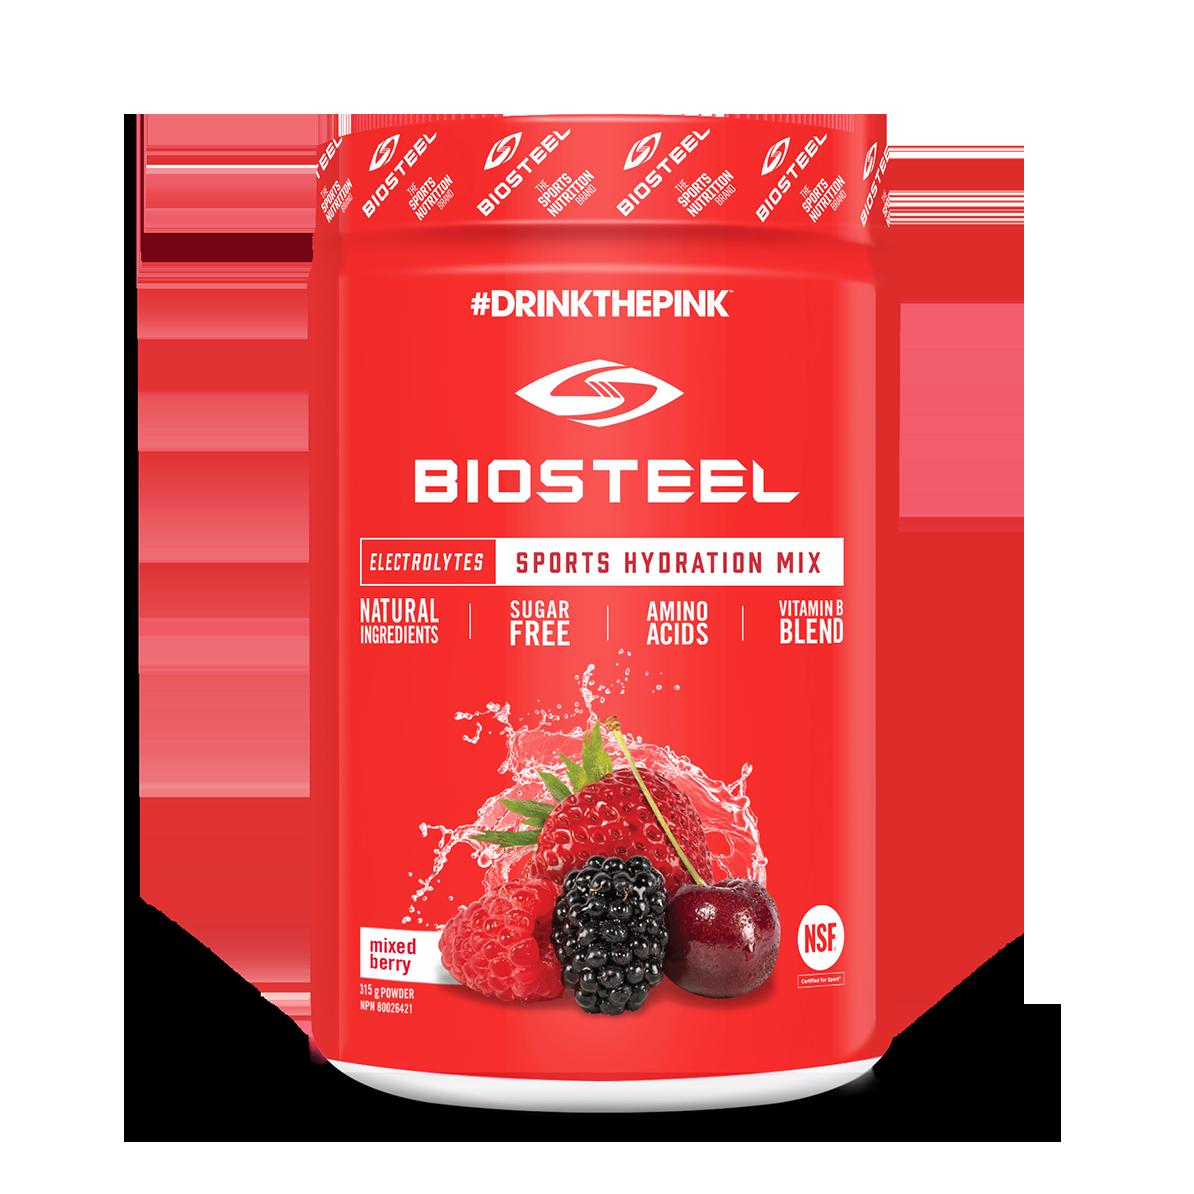 biosteel orange container